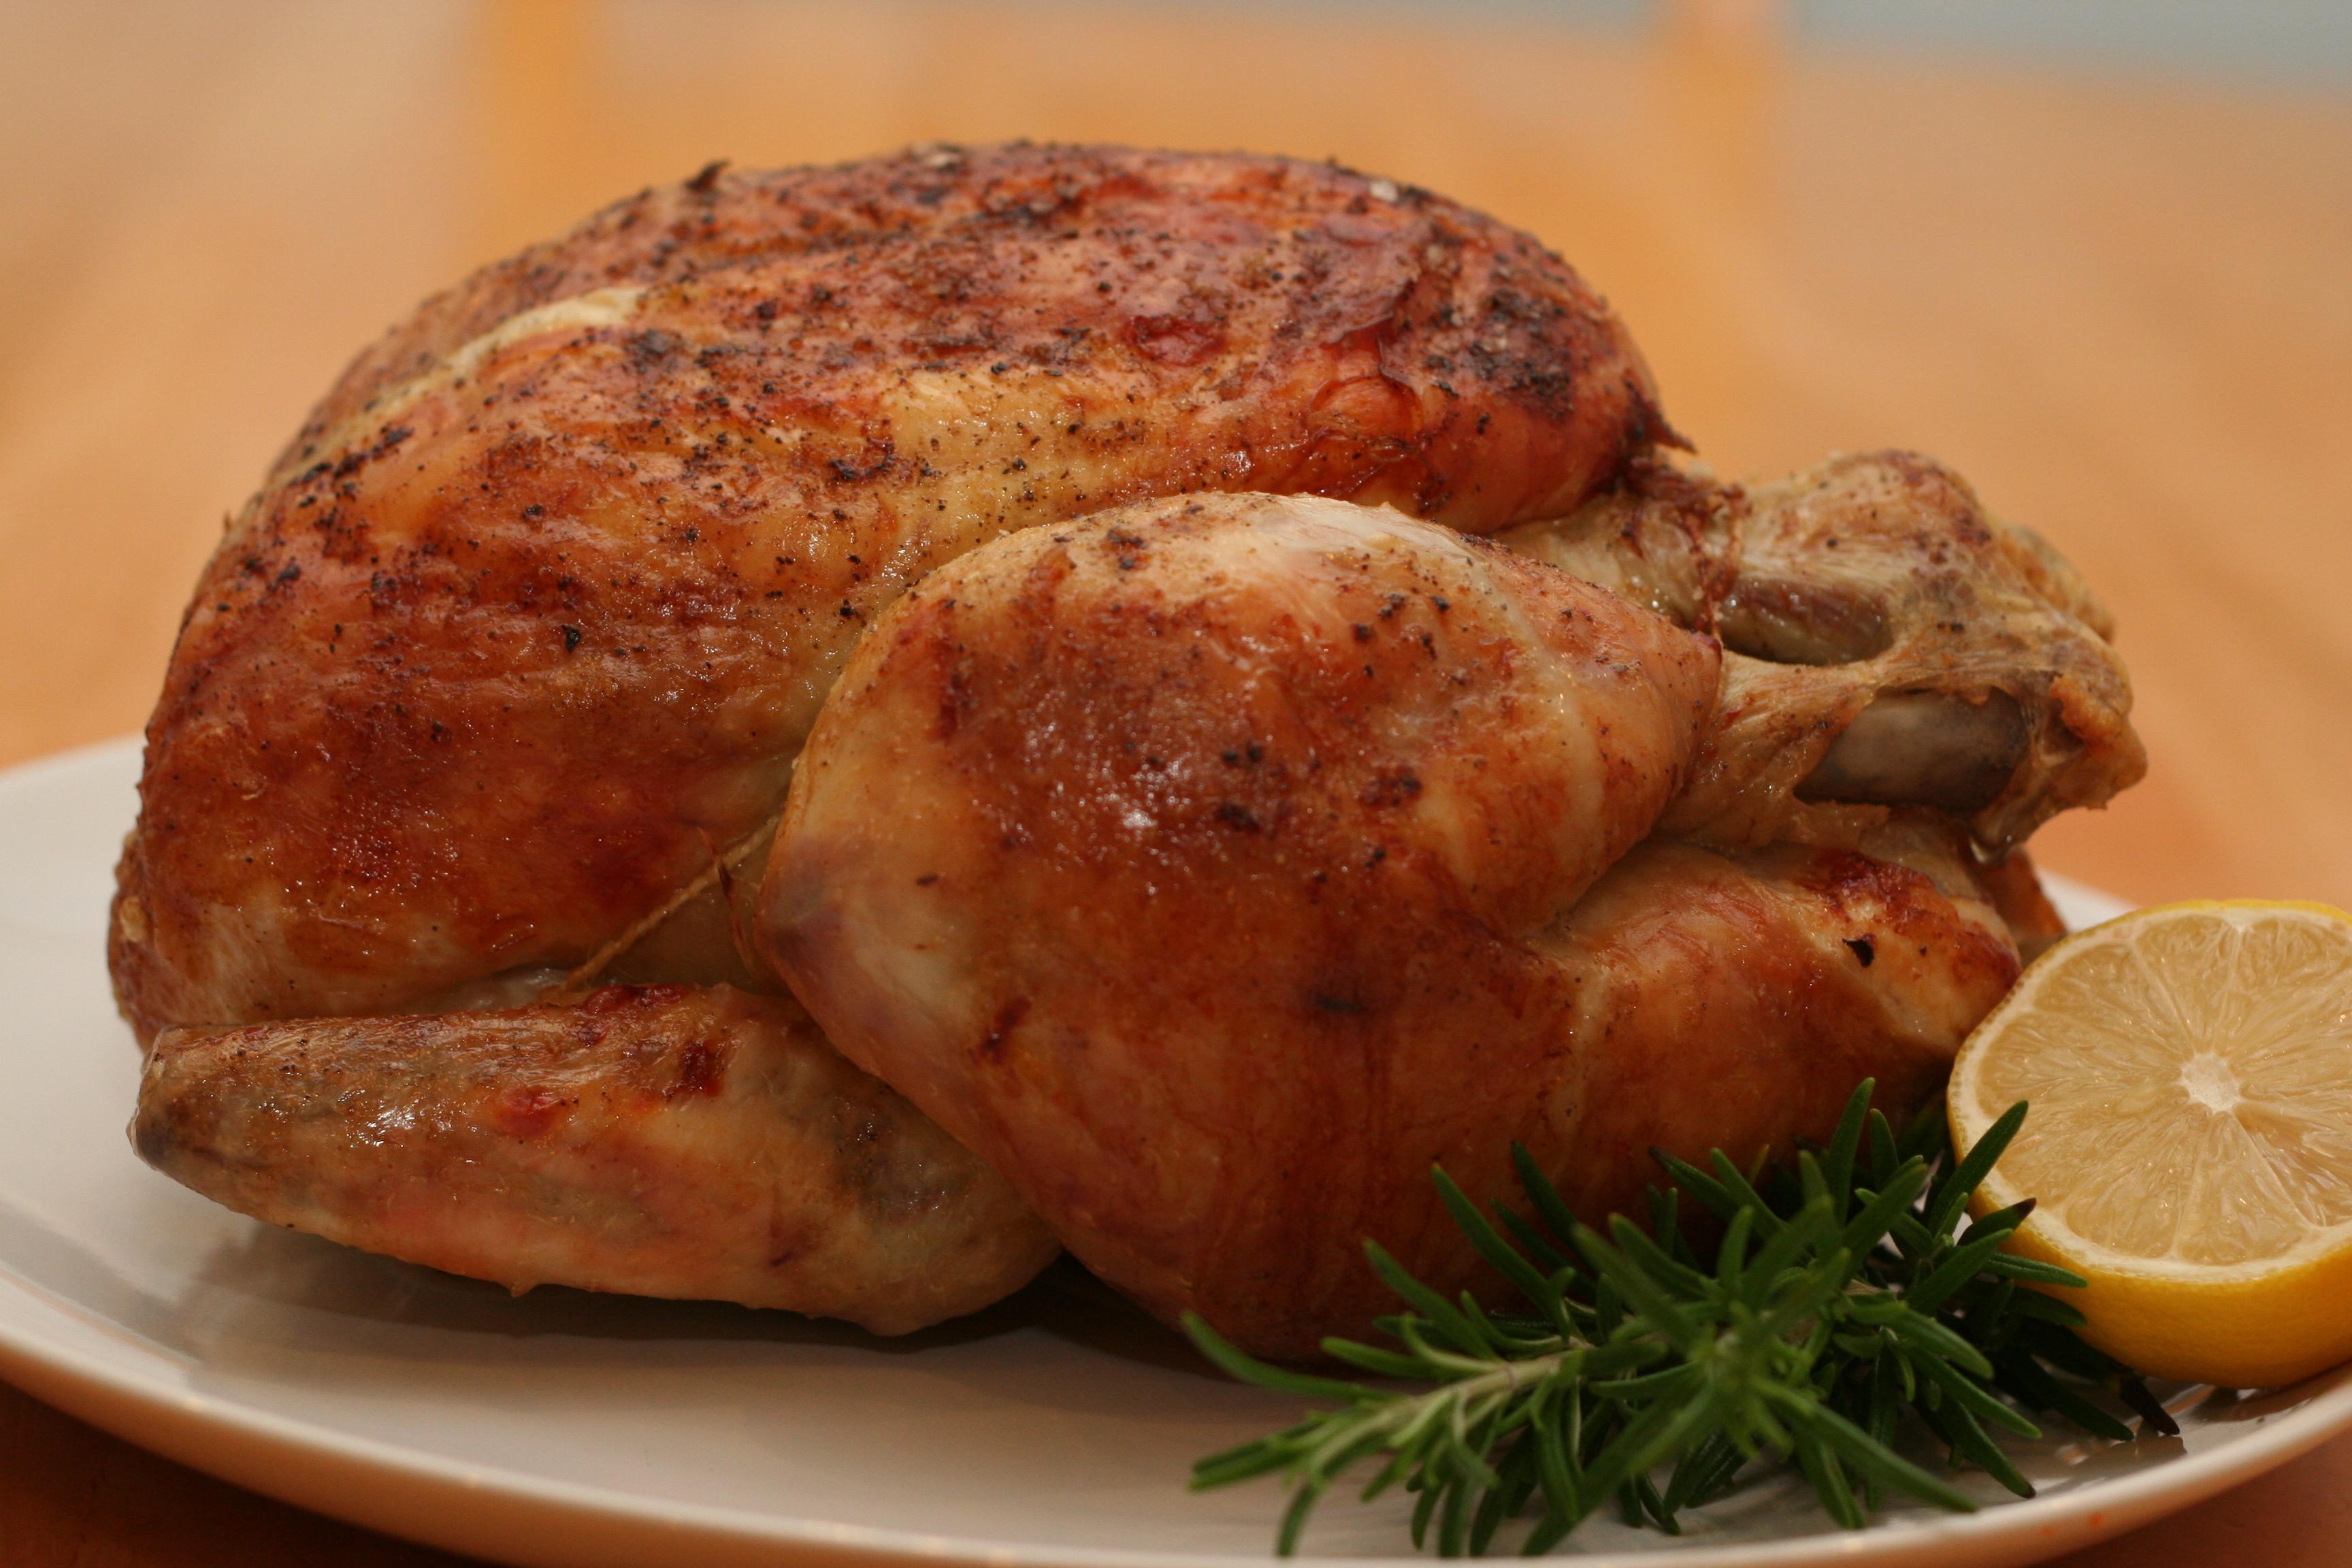 Roasted free range, grass fed, beyond organic whole chicken.